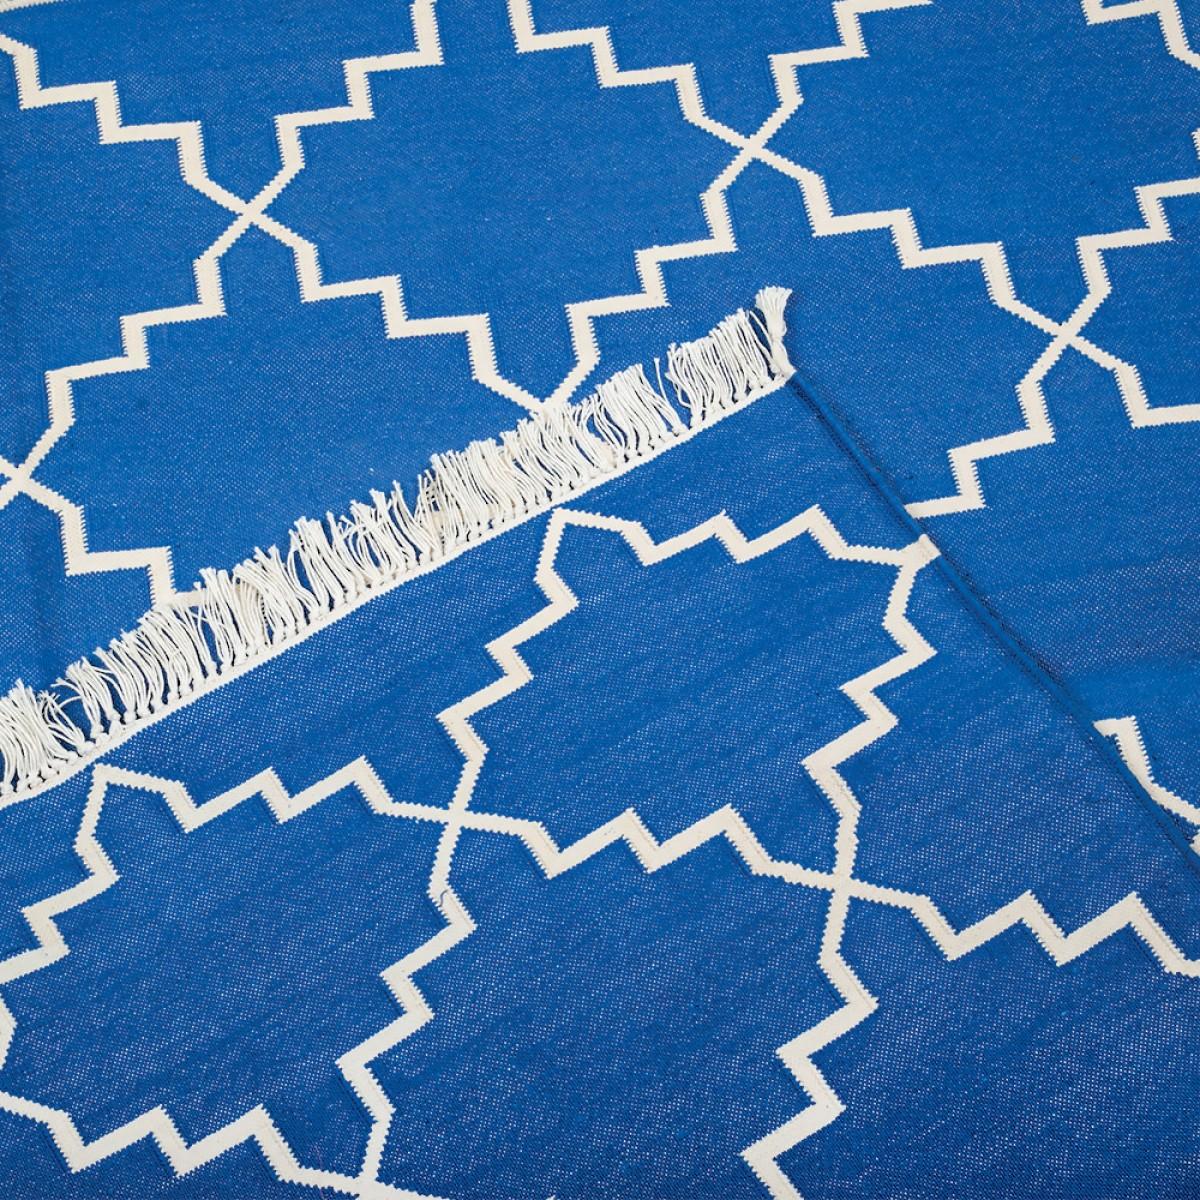 Cotton Floor Rugs - Blue & Zari